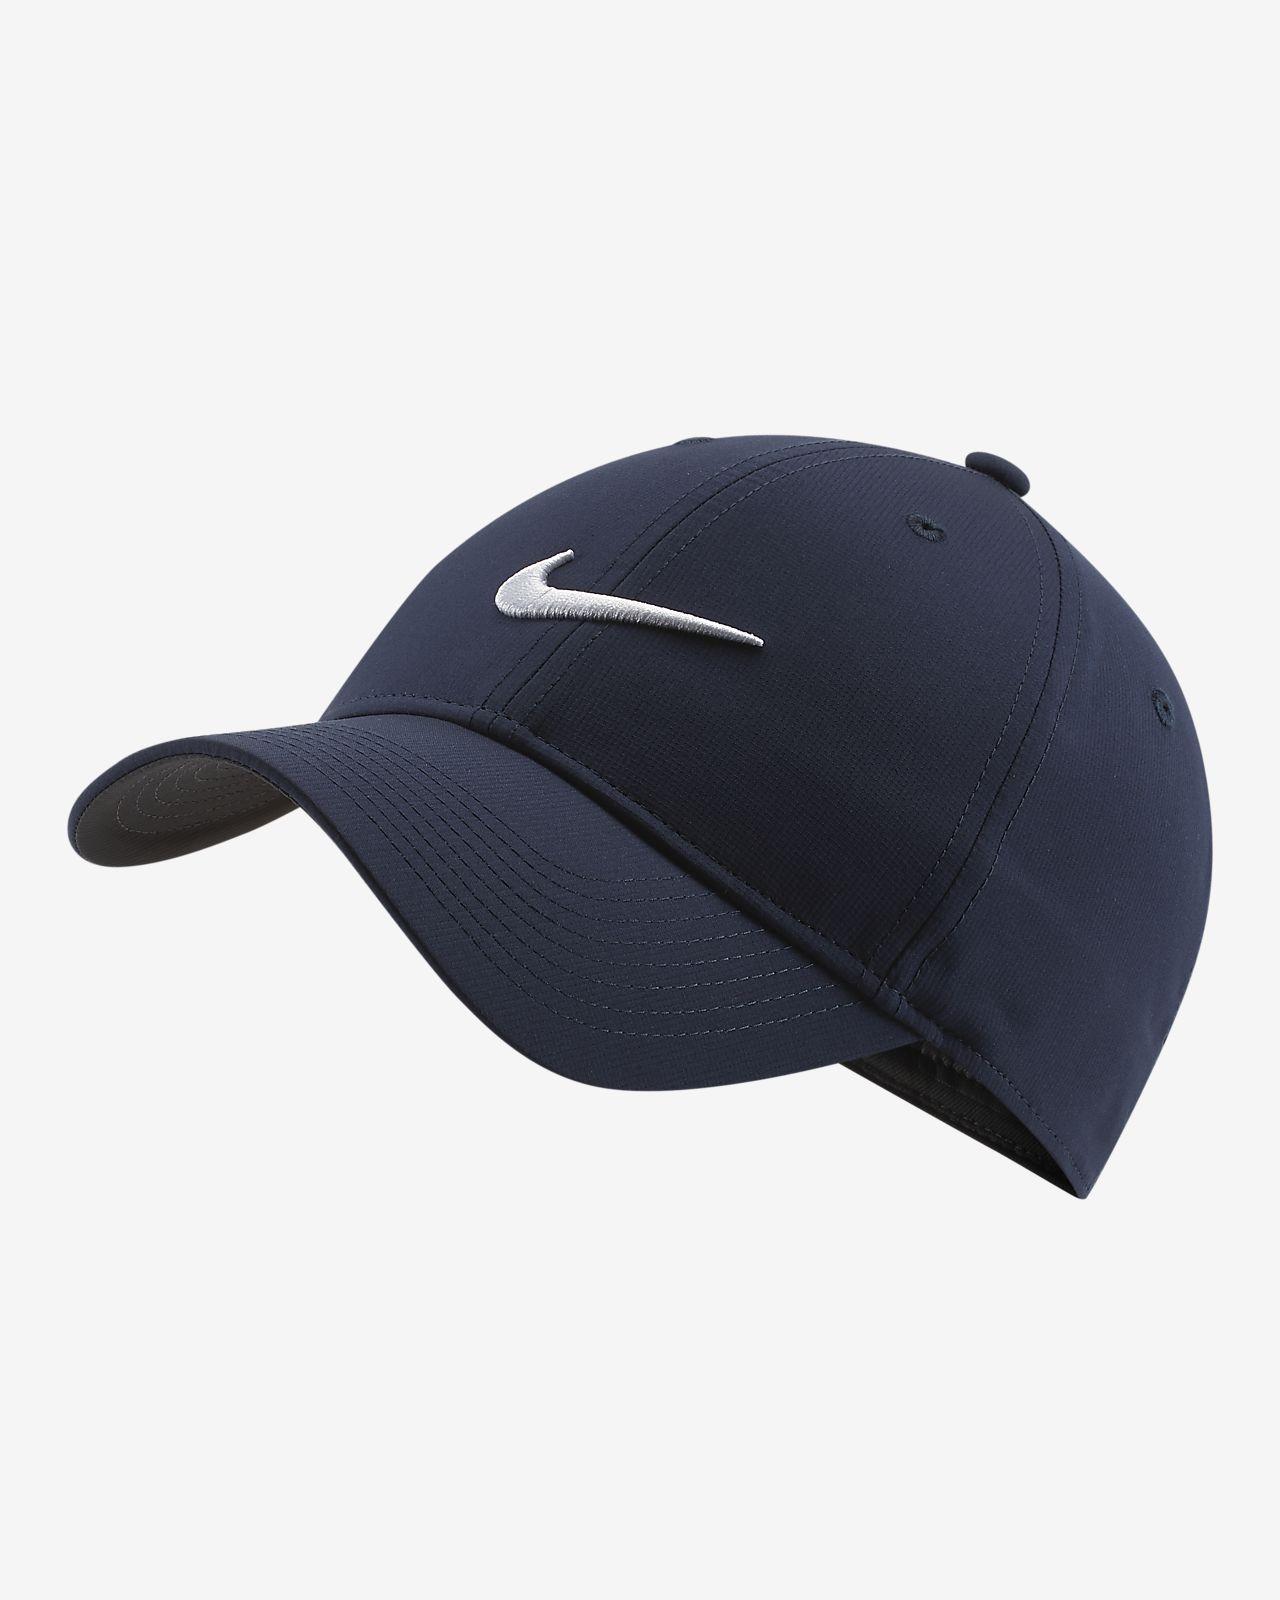 Nike Legacy 91 Verstellbare Golfkappe